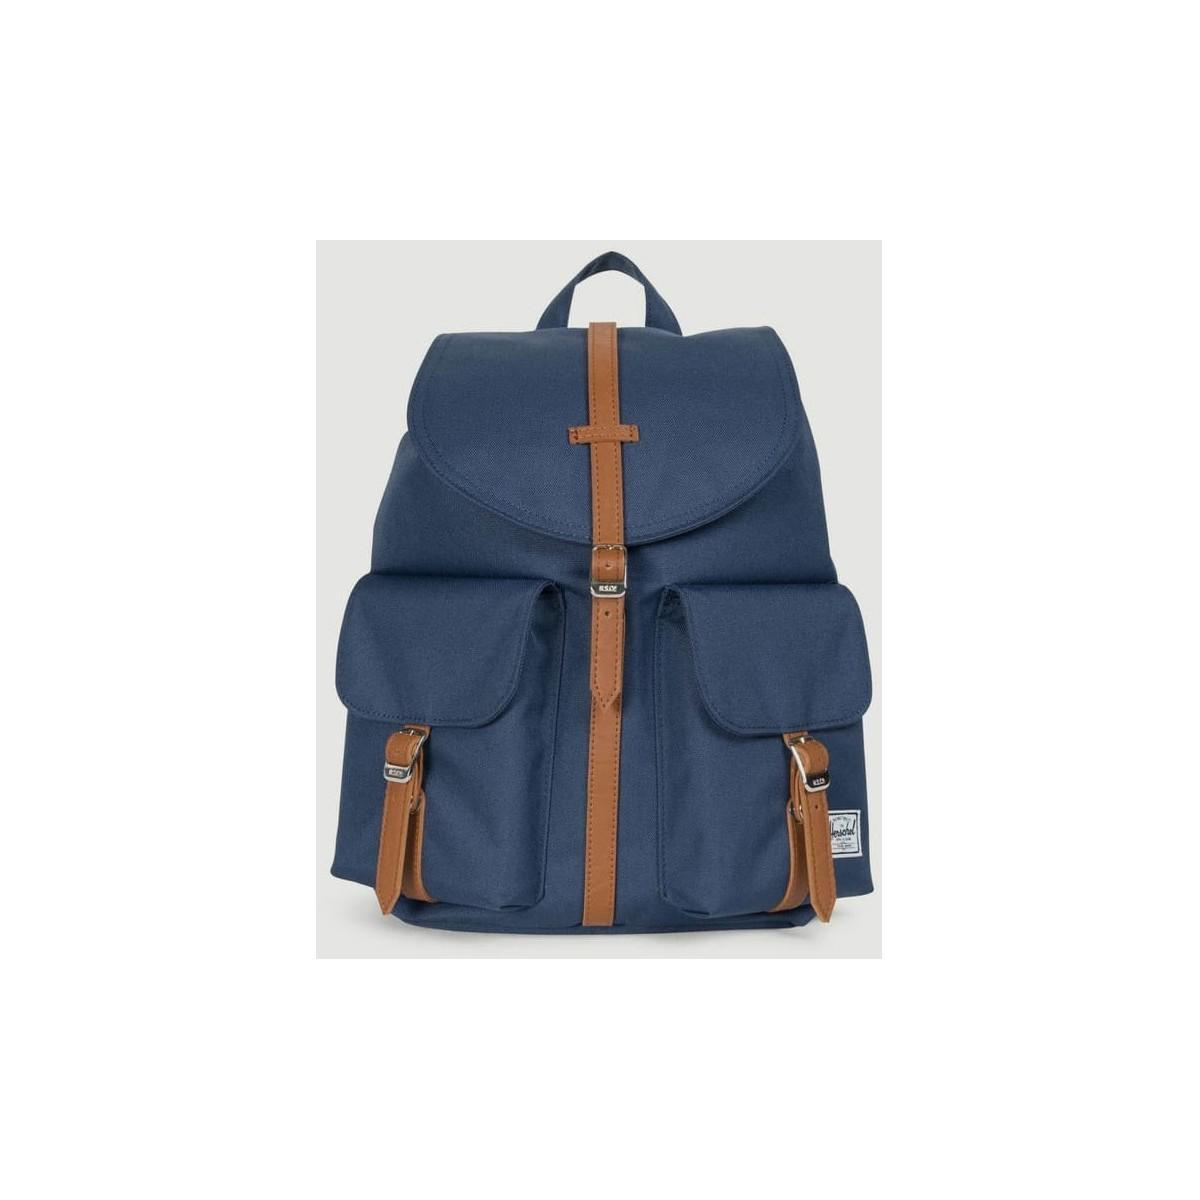 76f8a4505960 Herschel Supply Co. Dawson Xs Backpack 55183 Navy Blue Men s Bag In ...